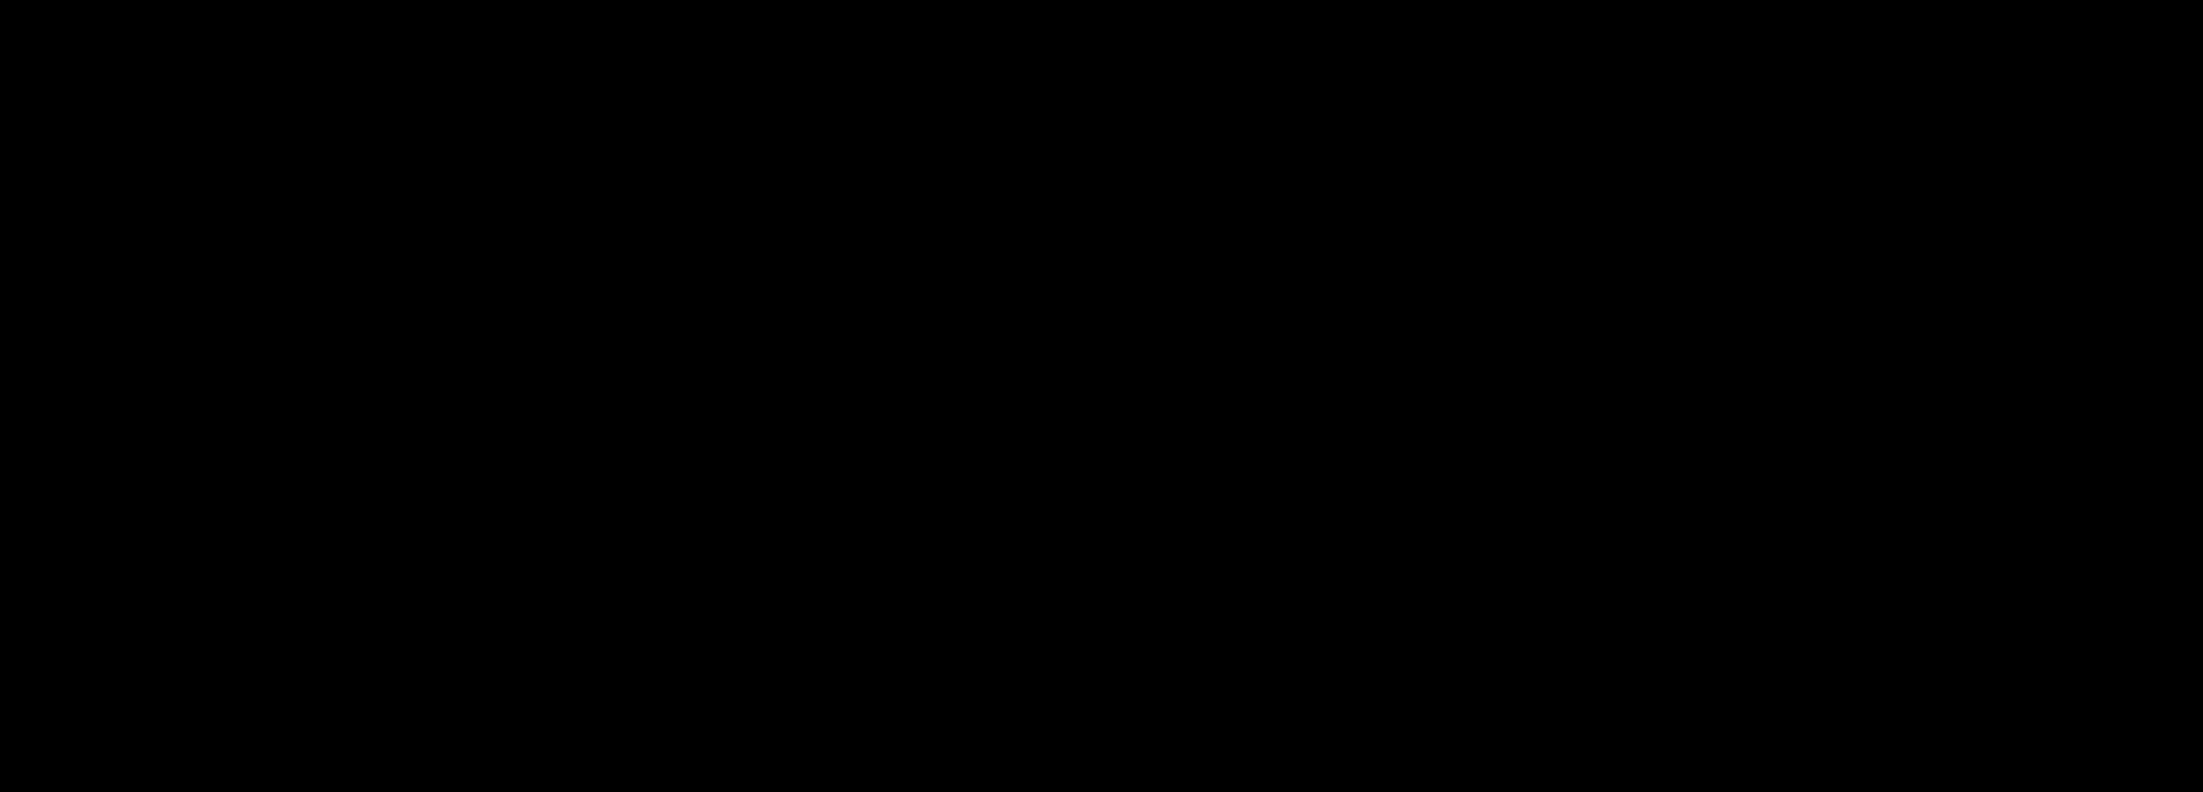 Lightning clipart black and white. Bolt big image png